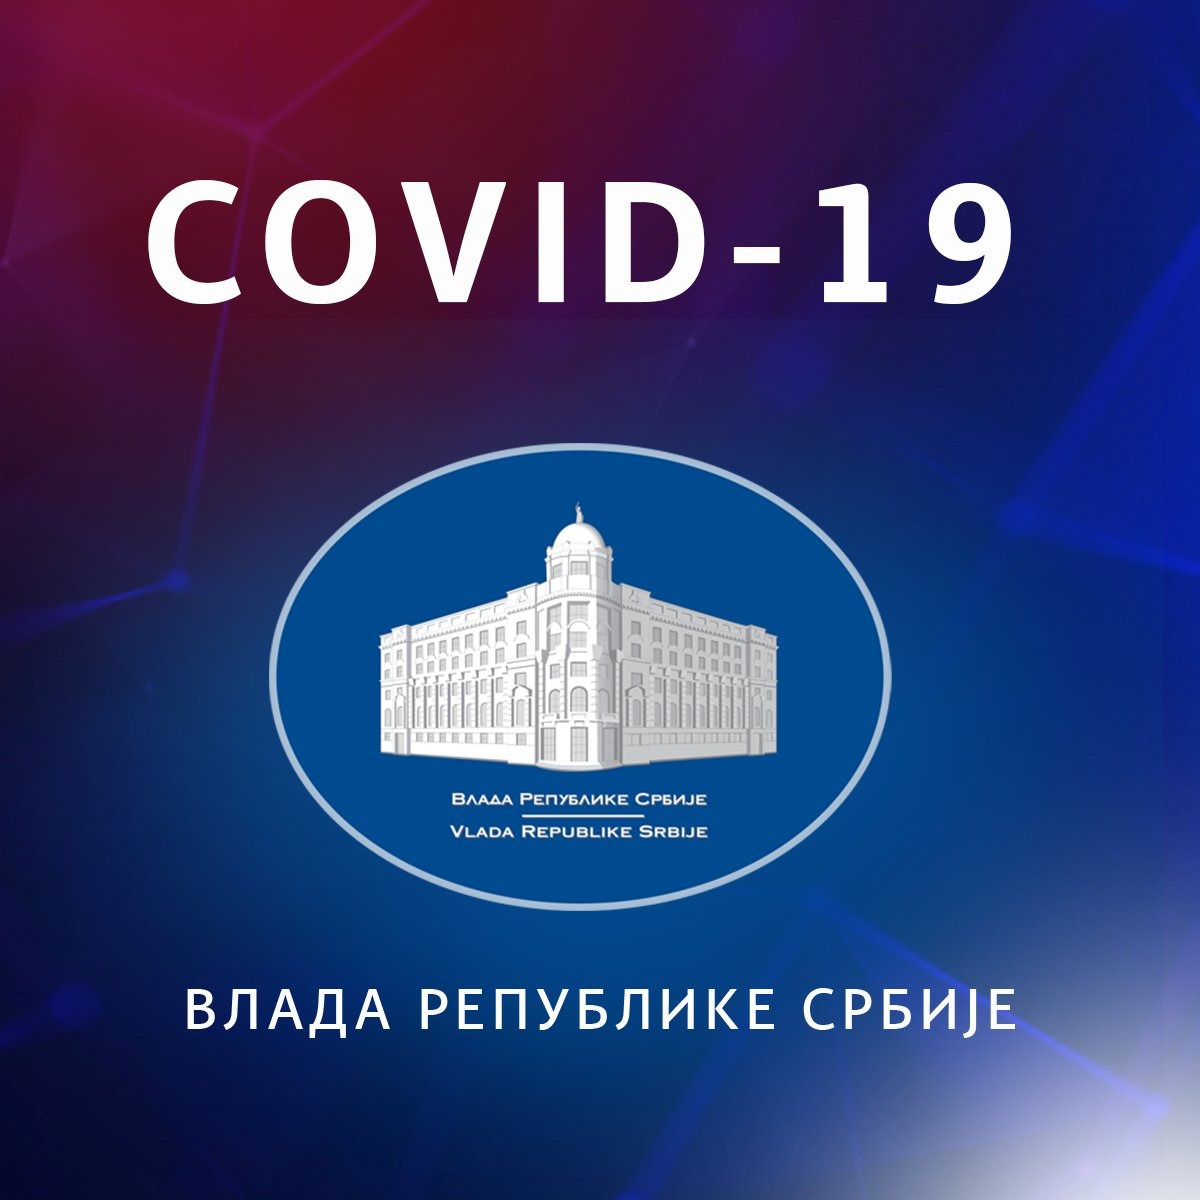 Covid 19 nove mere vlade